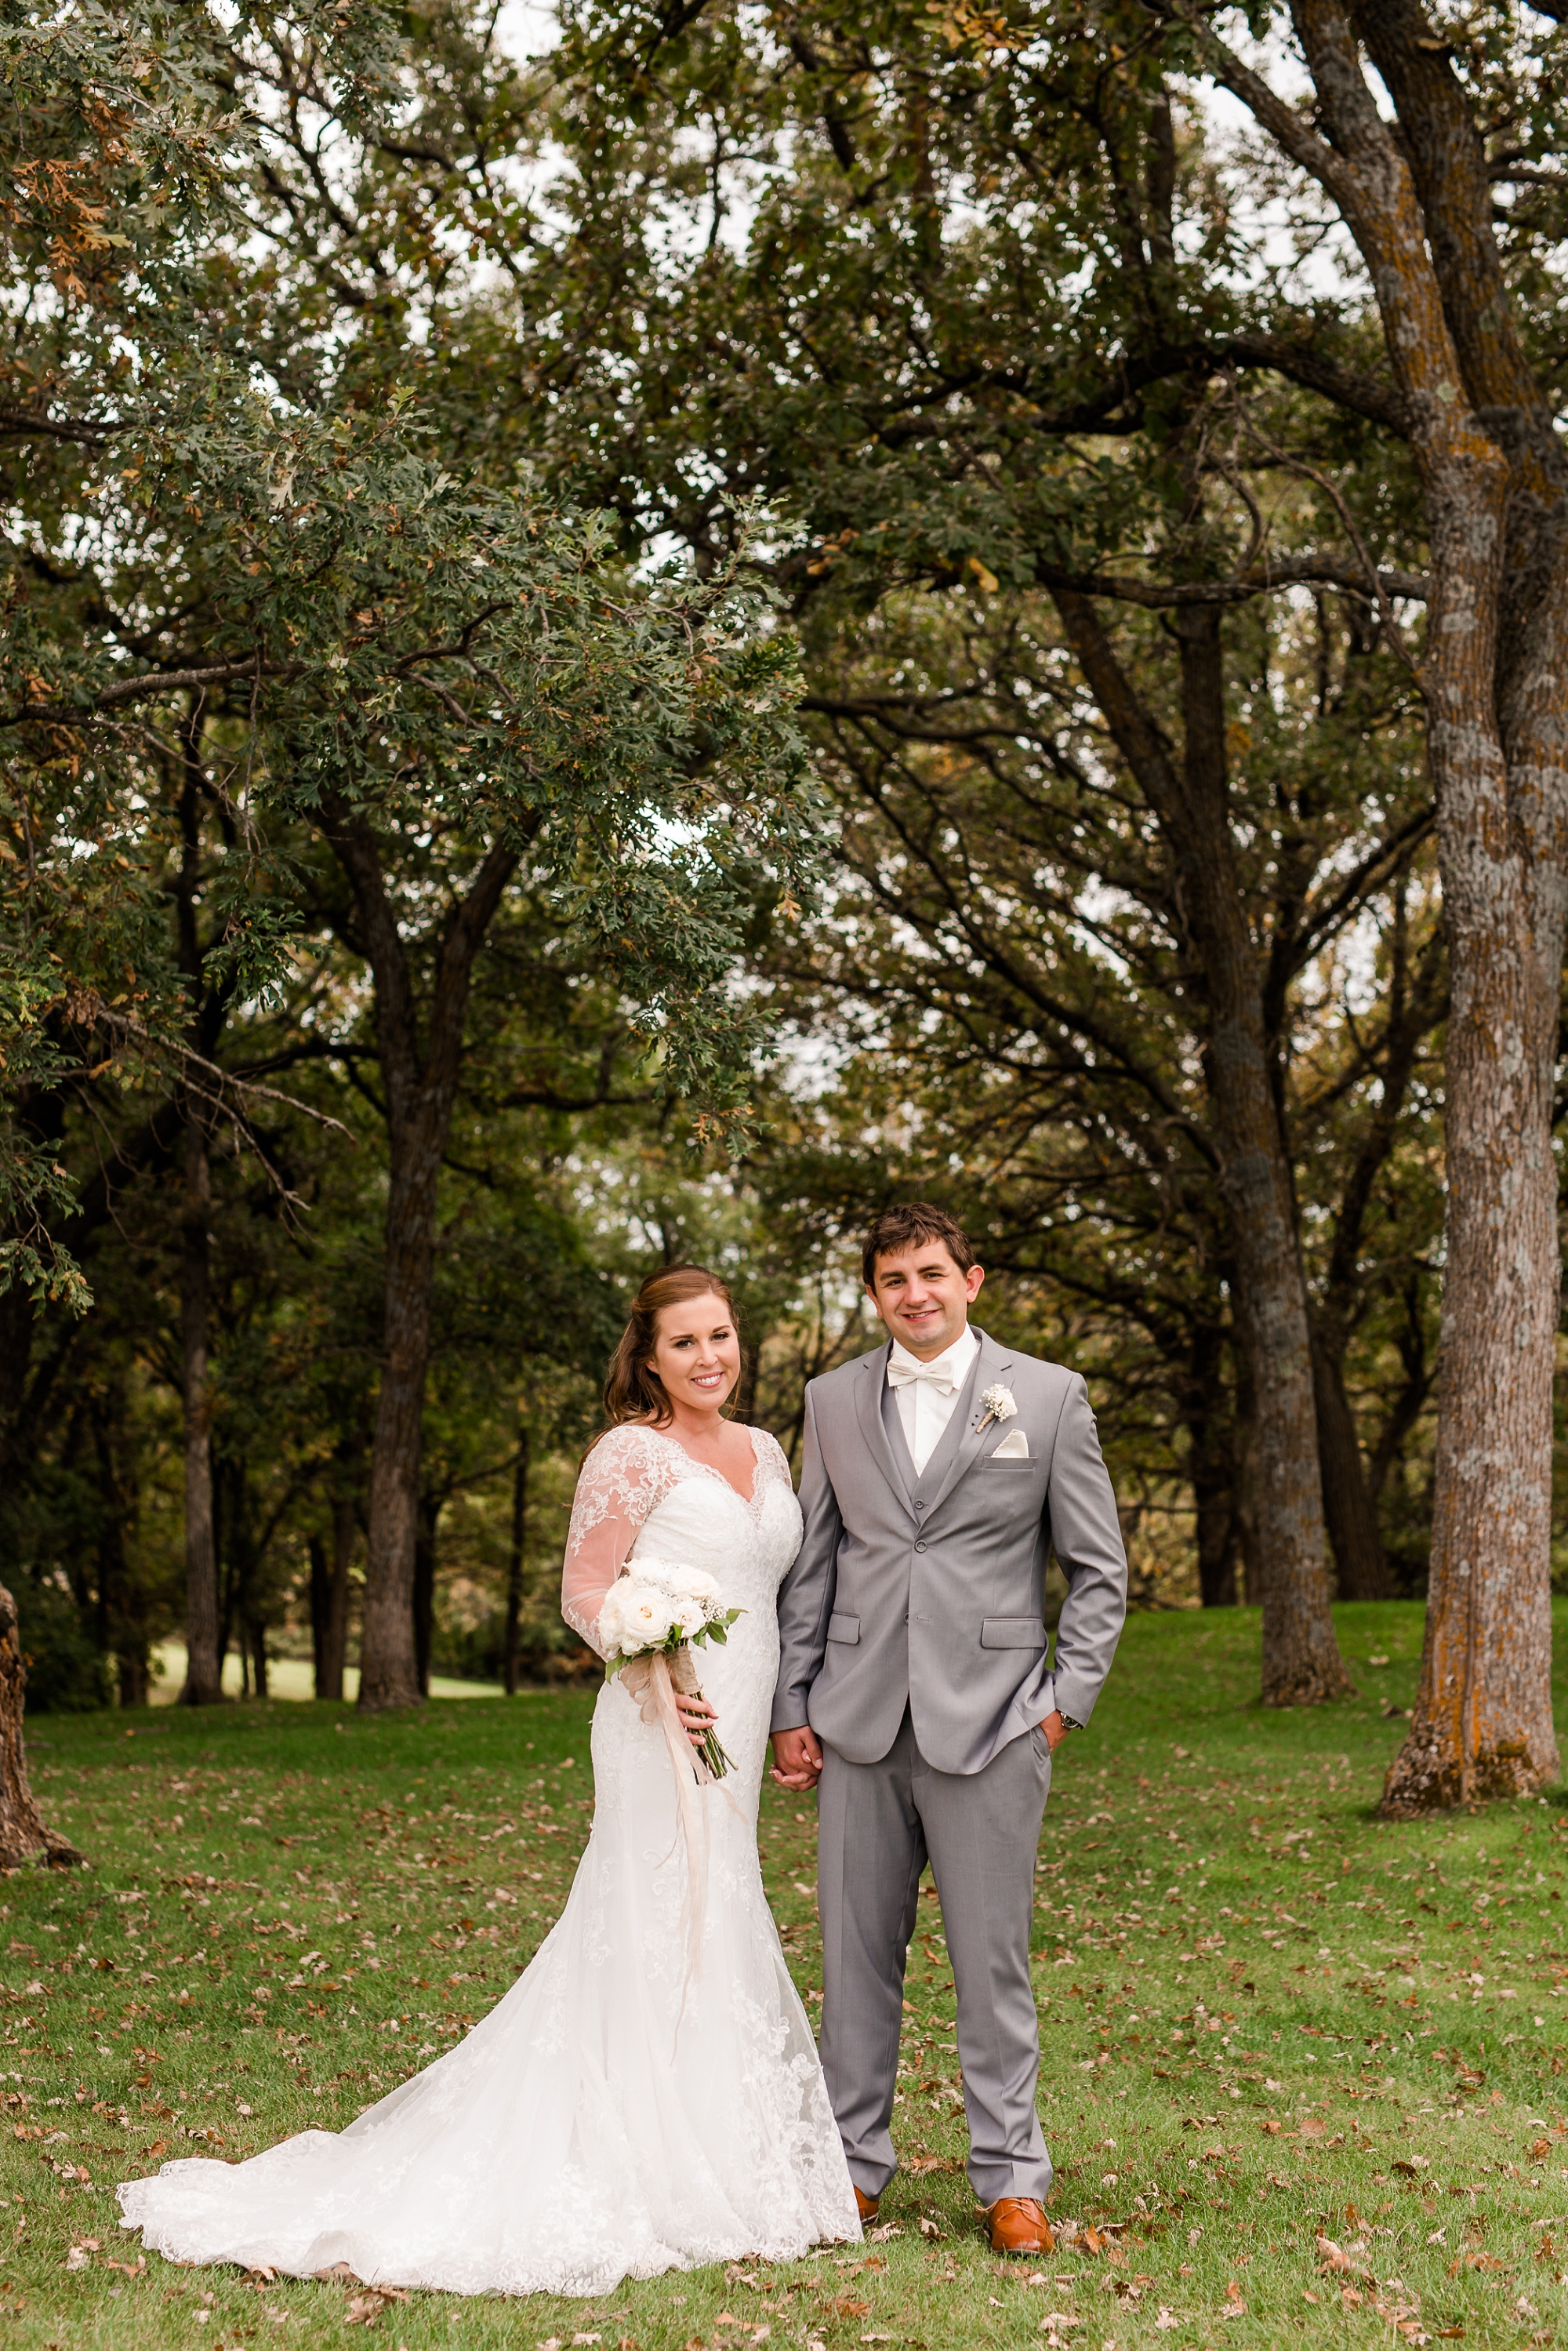 AmberLangerudPhotography_Fair Hills Resort Lakeside Wedding in Minnesota_3446.jpg